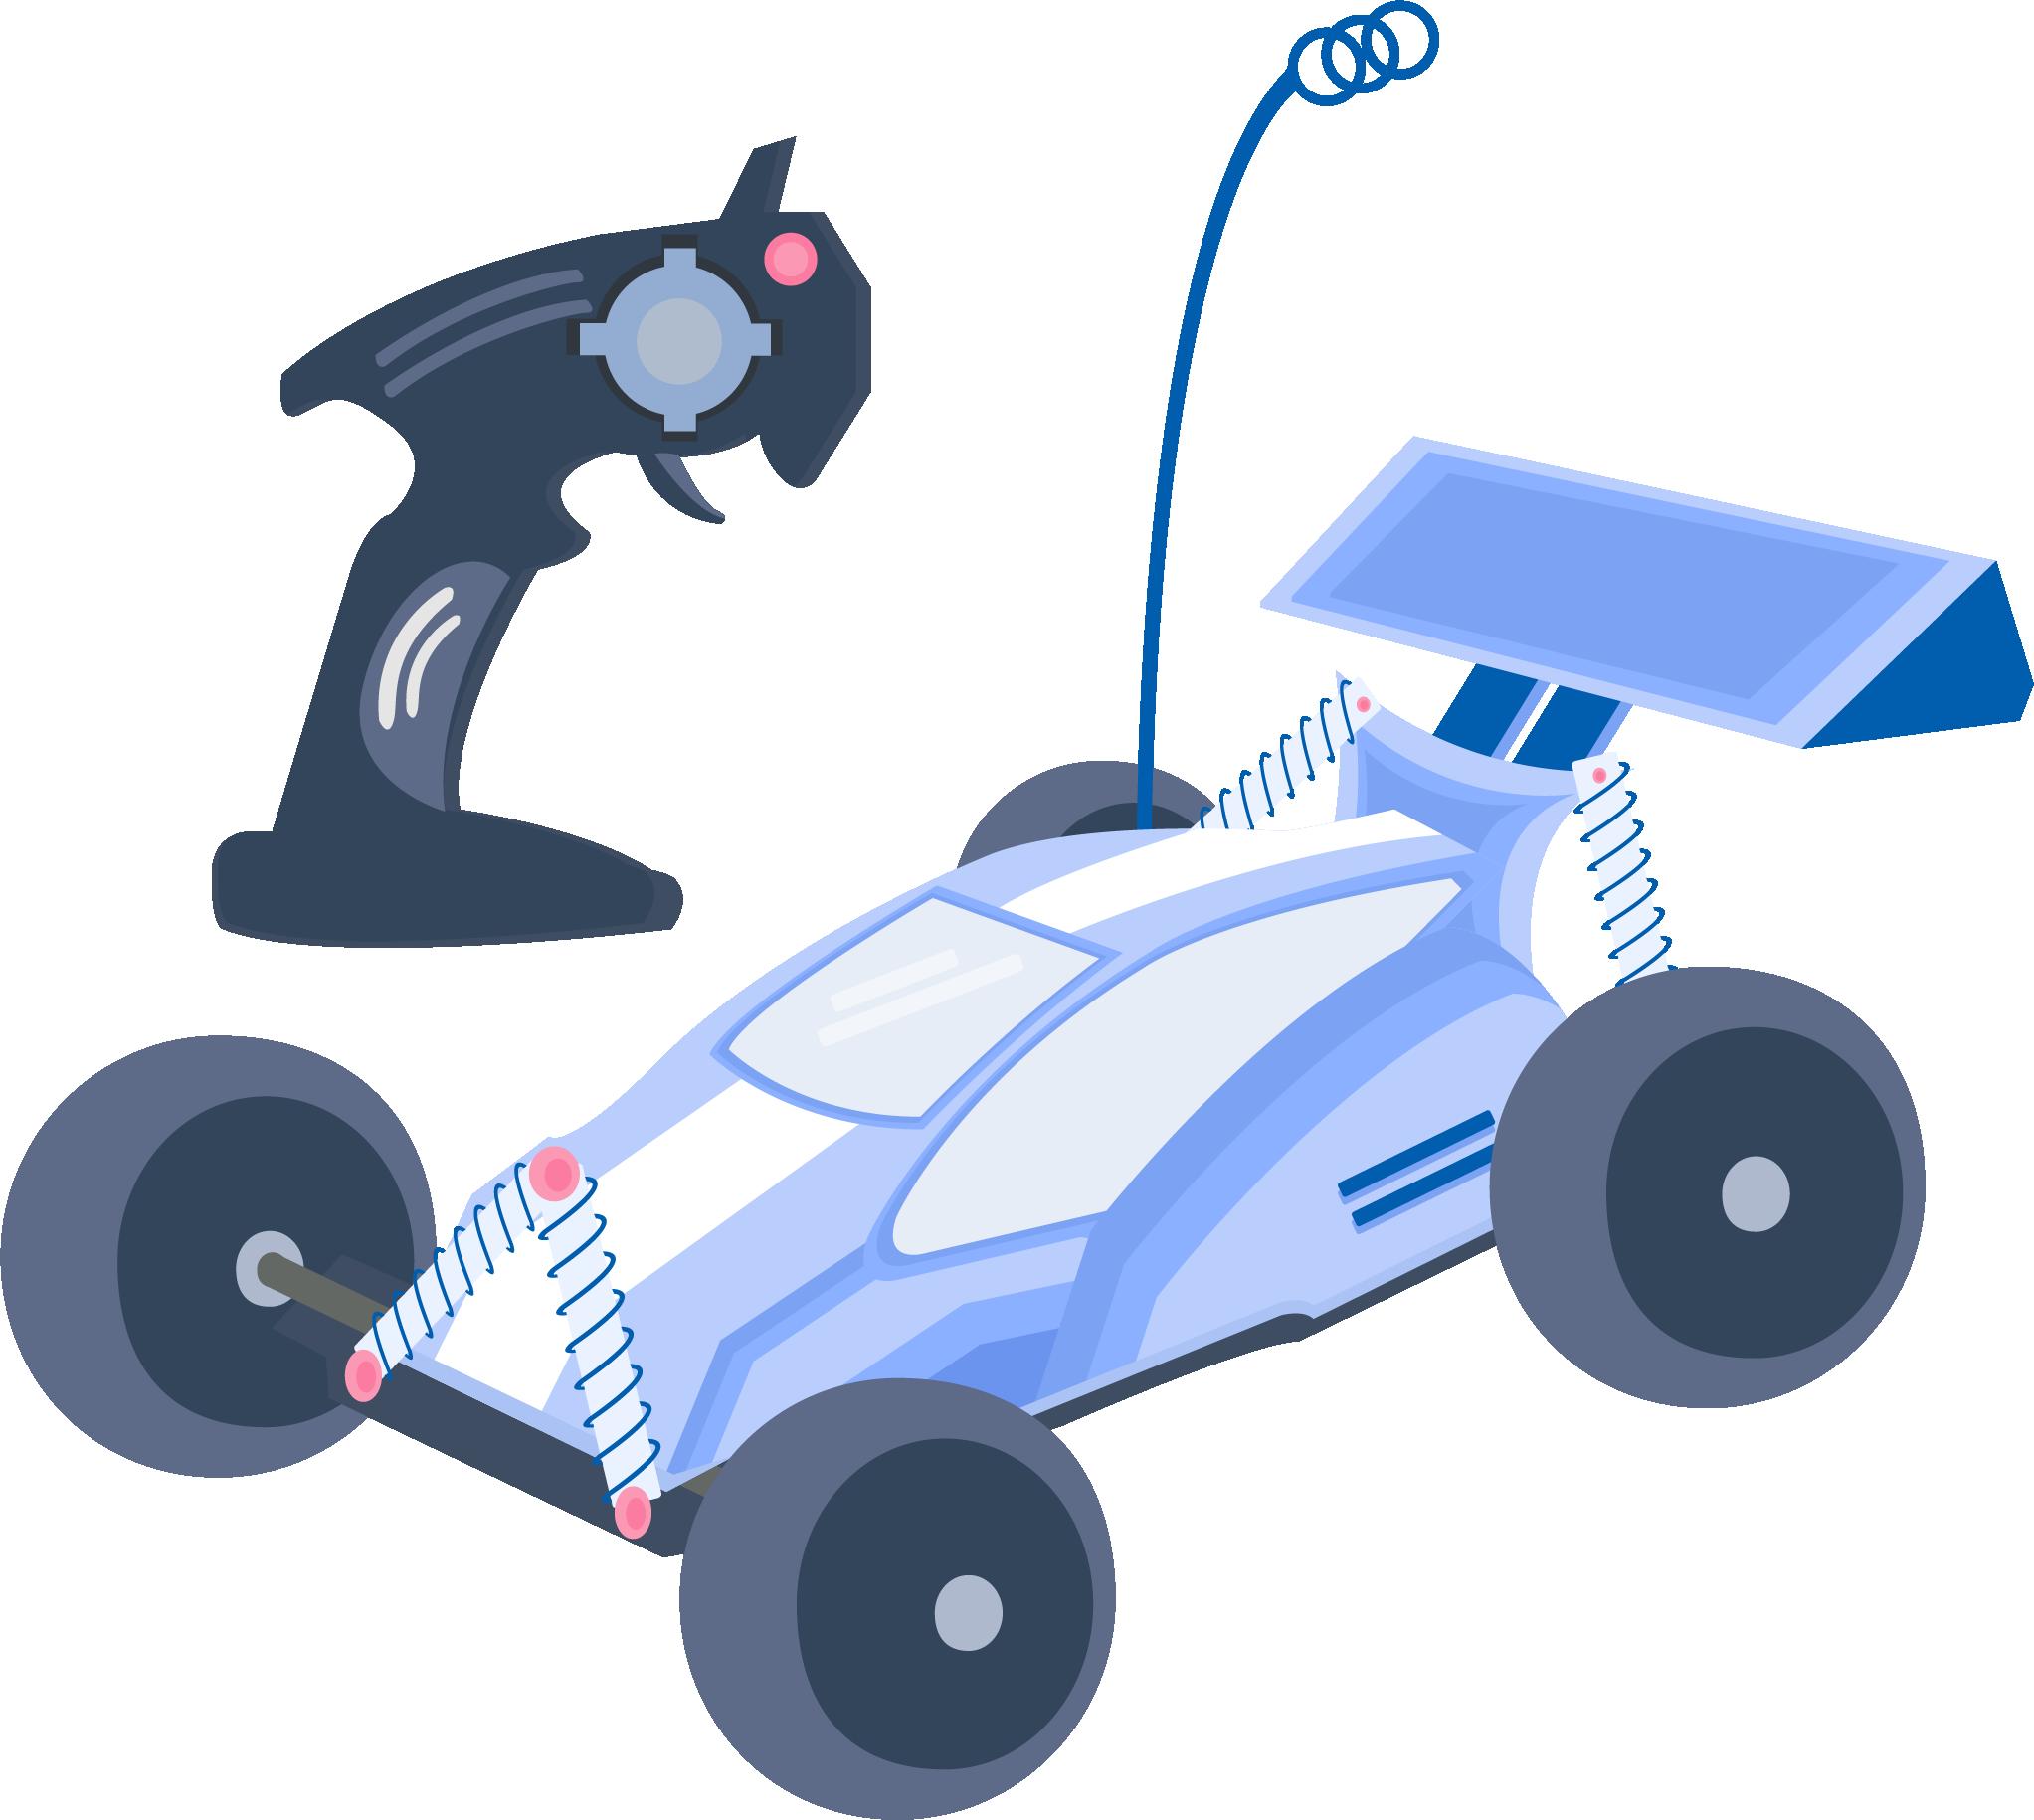 Wheel clipart four wheel. Radio controlled car toy